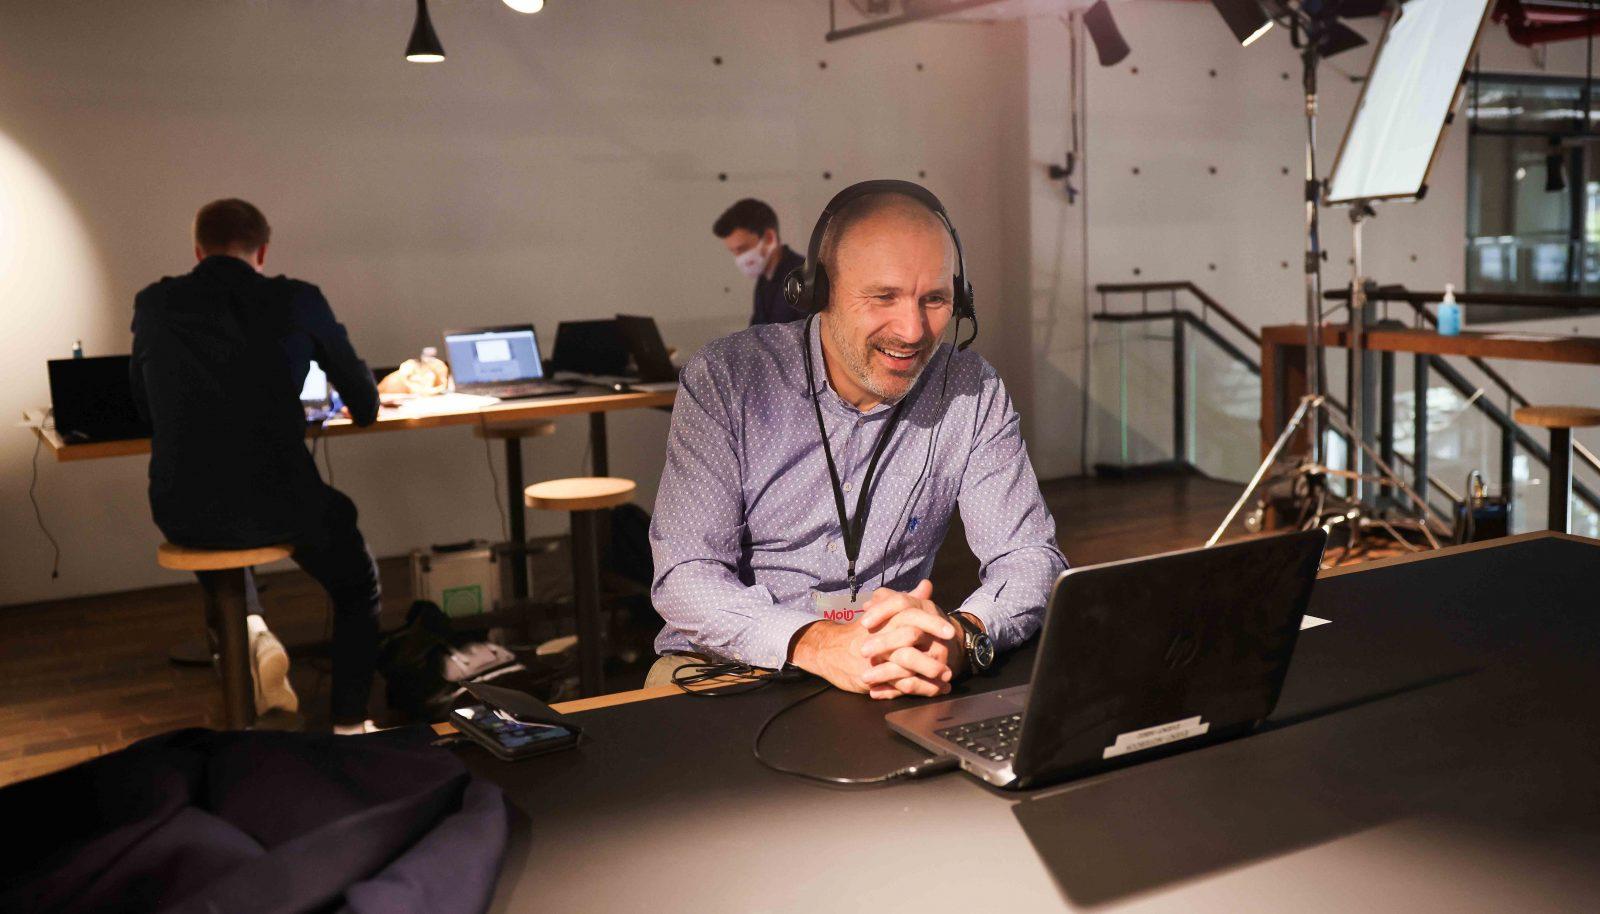 Peter Kropsch beim digitalen Networking.